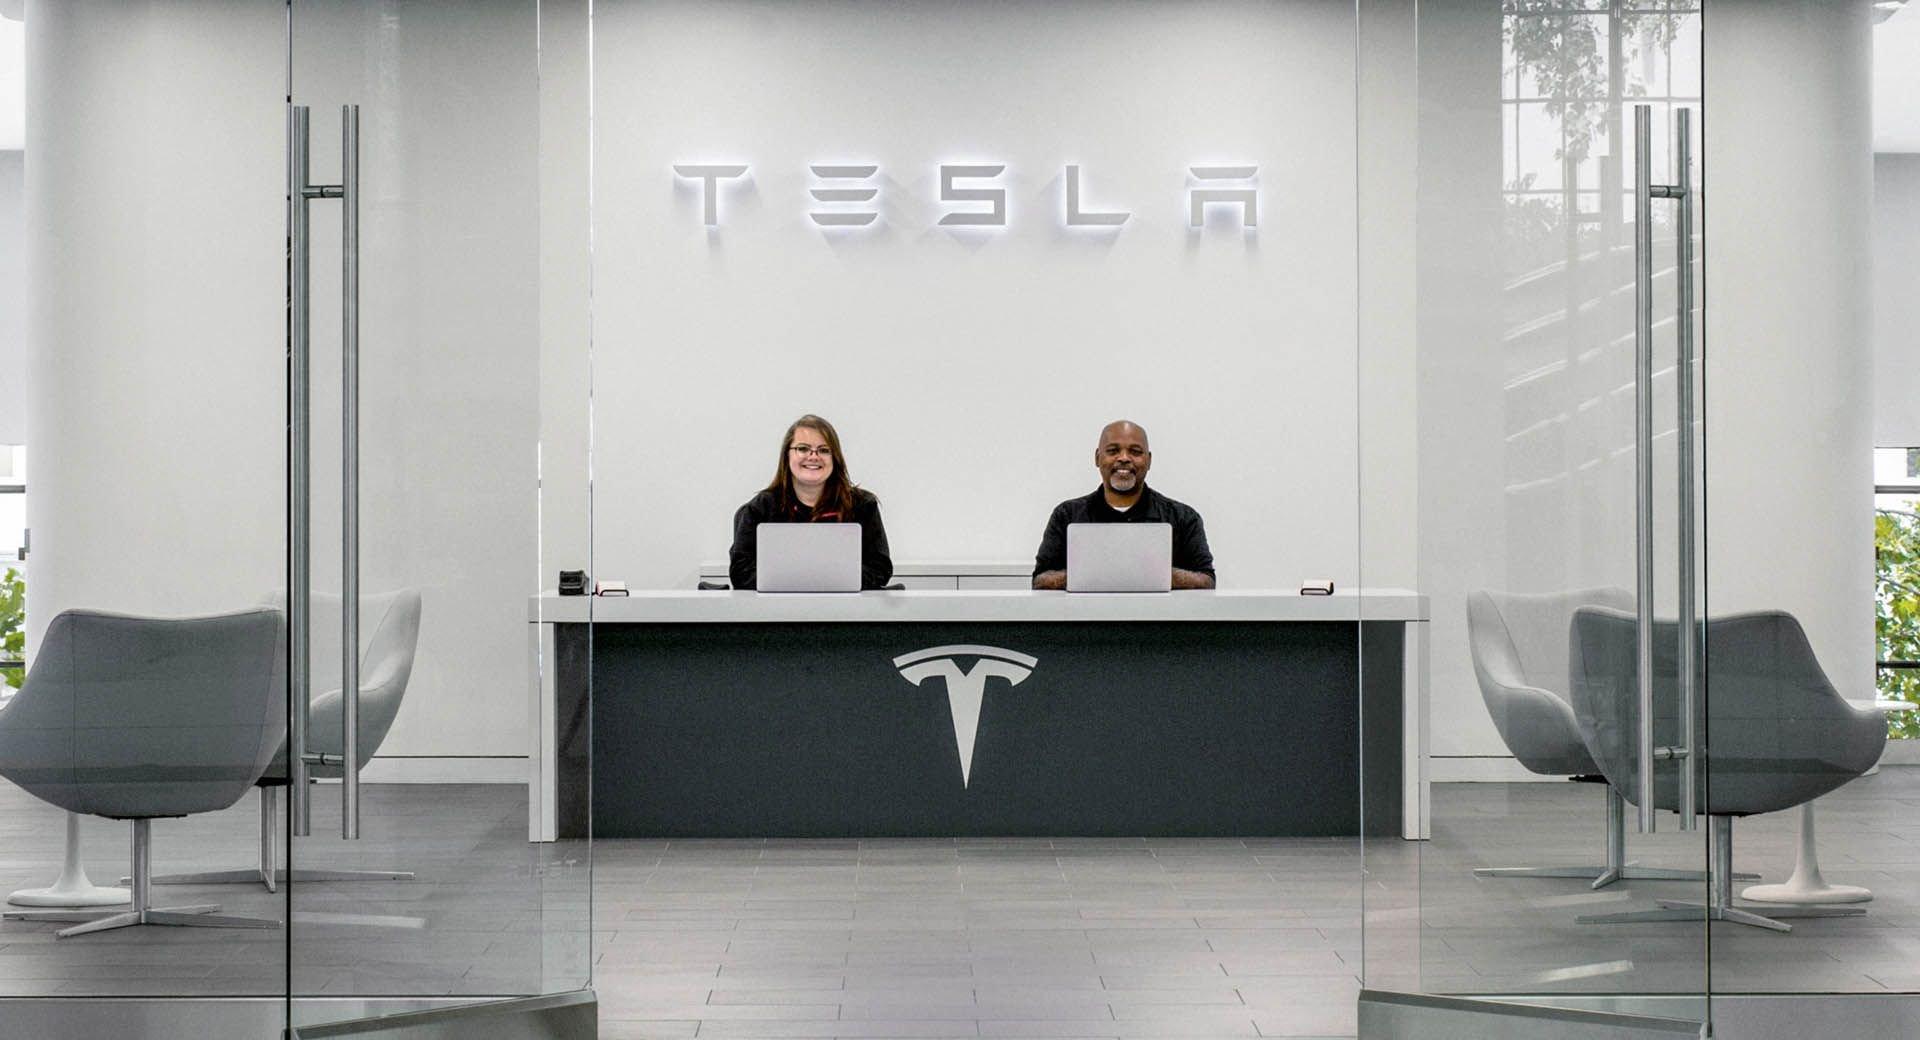 tesla-service-lobby.jpg